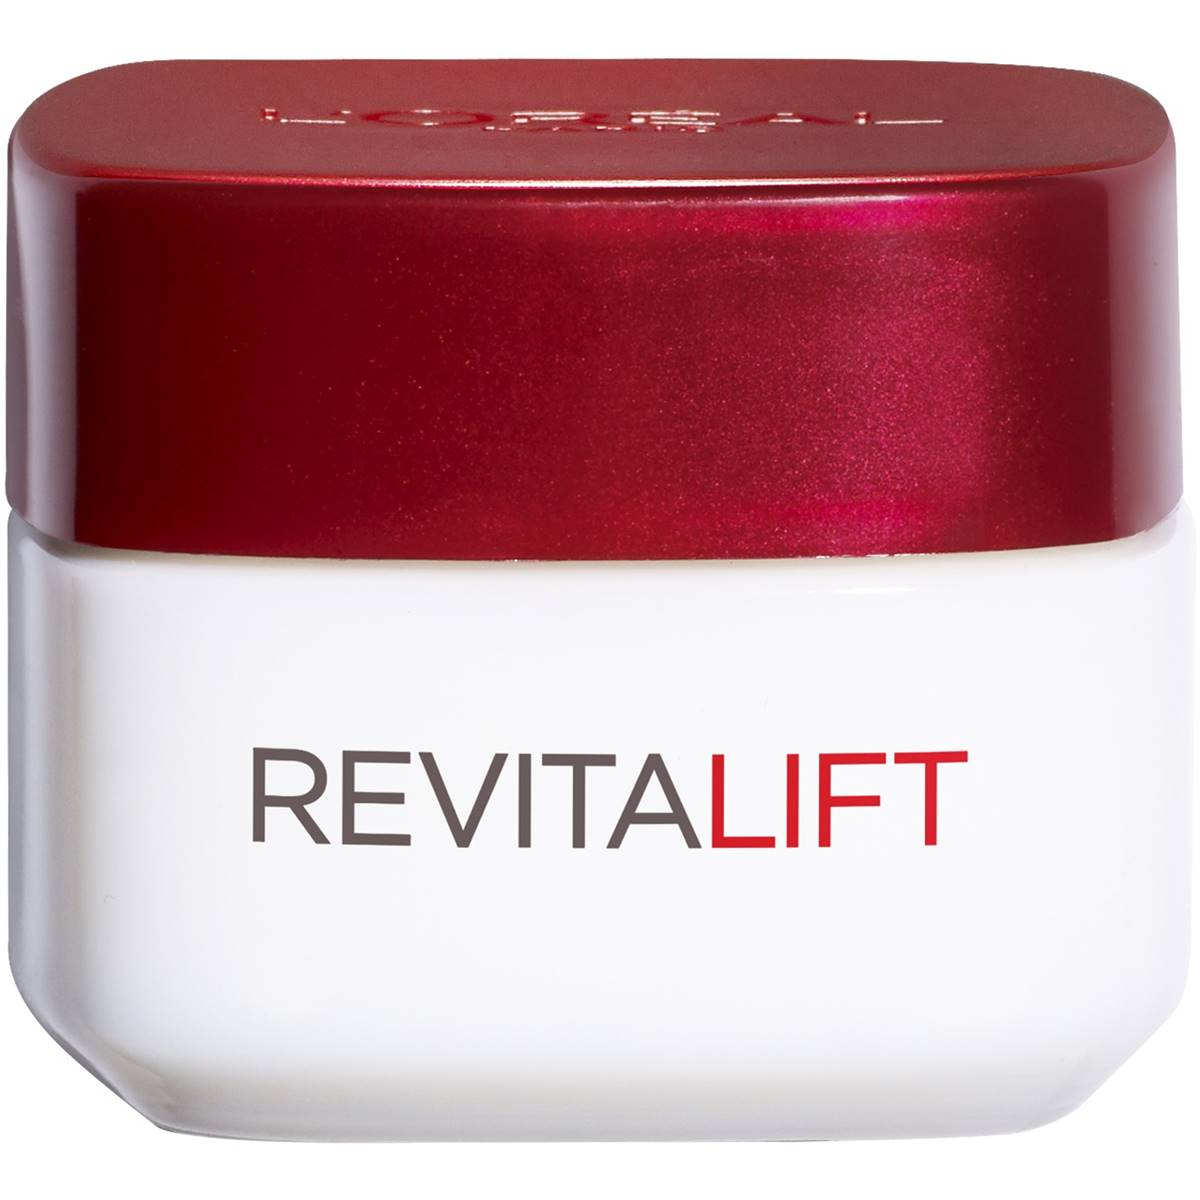 L'oreal Revitalift Eye Cream | Woolworths